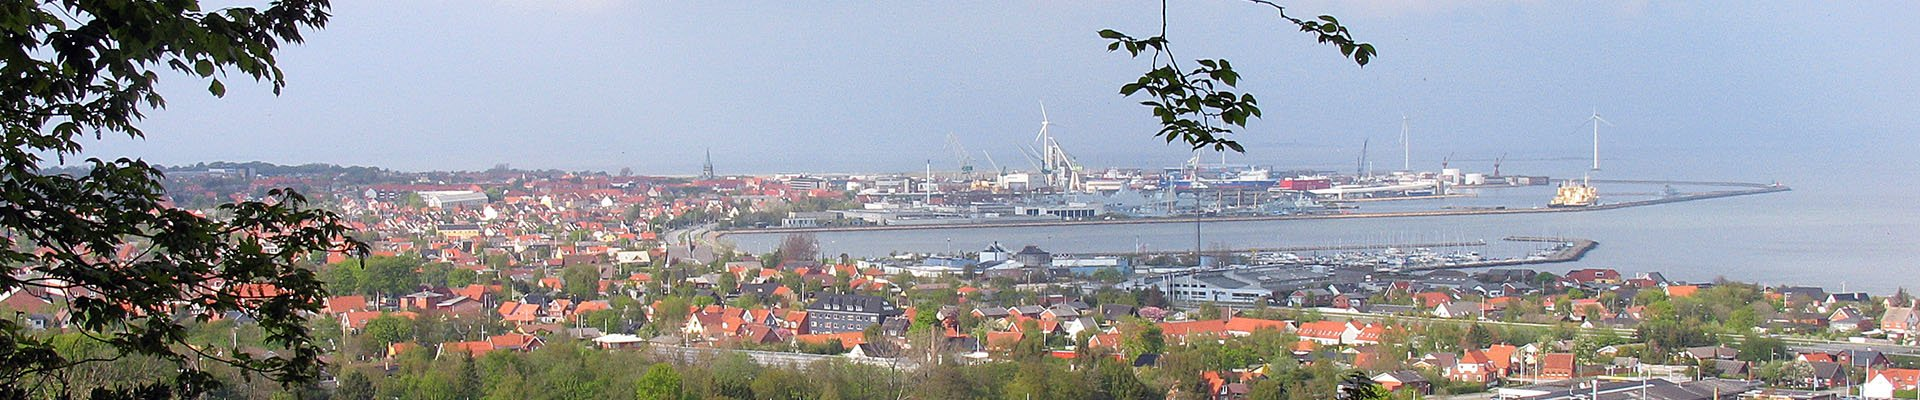 Frederikshavn Kommune chat